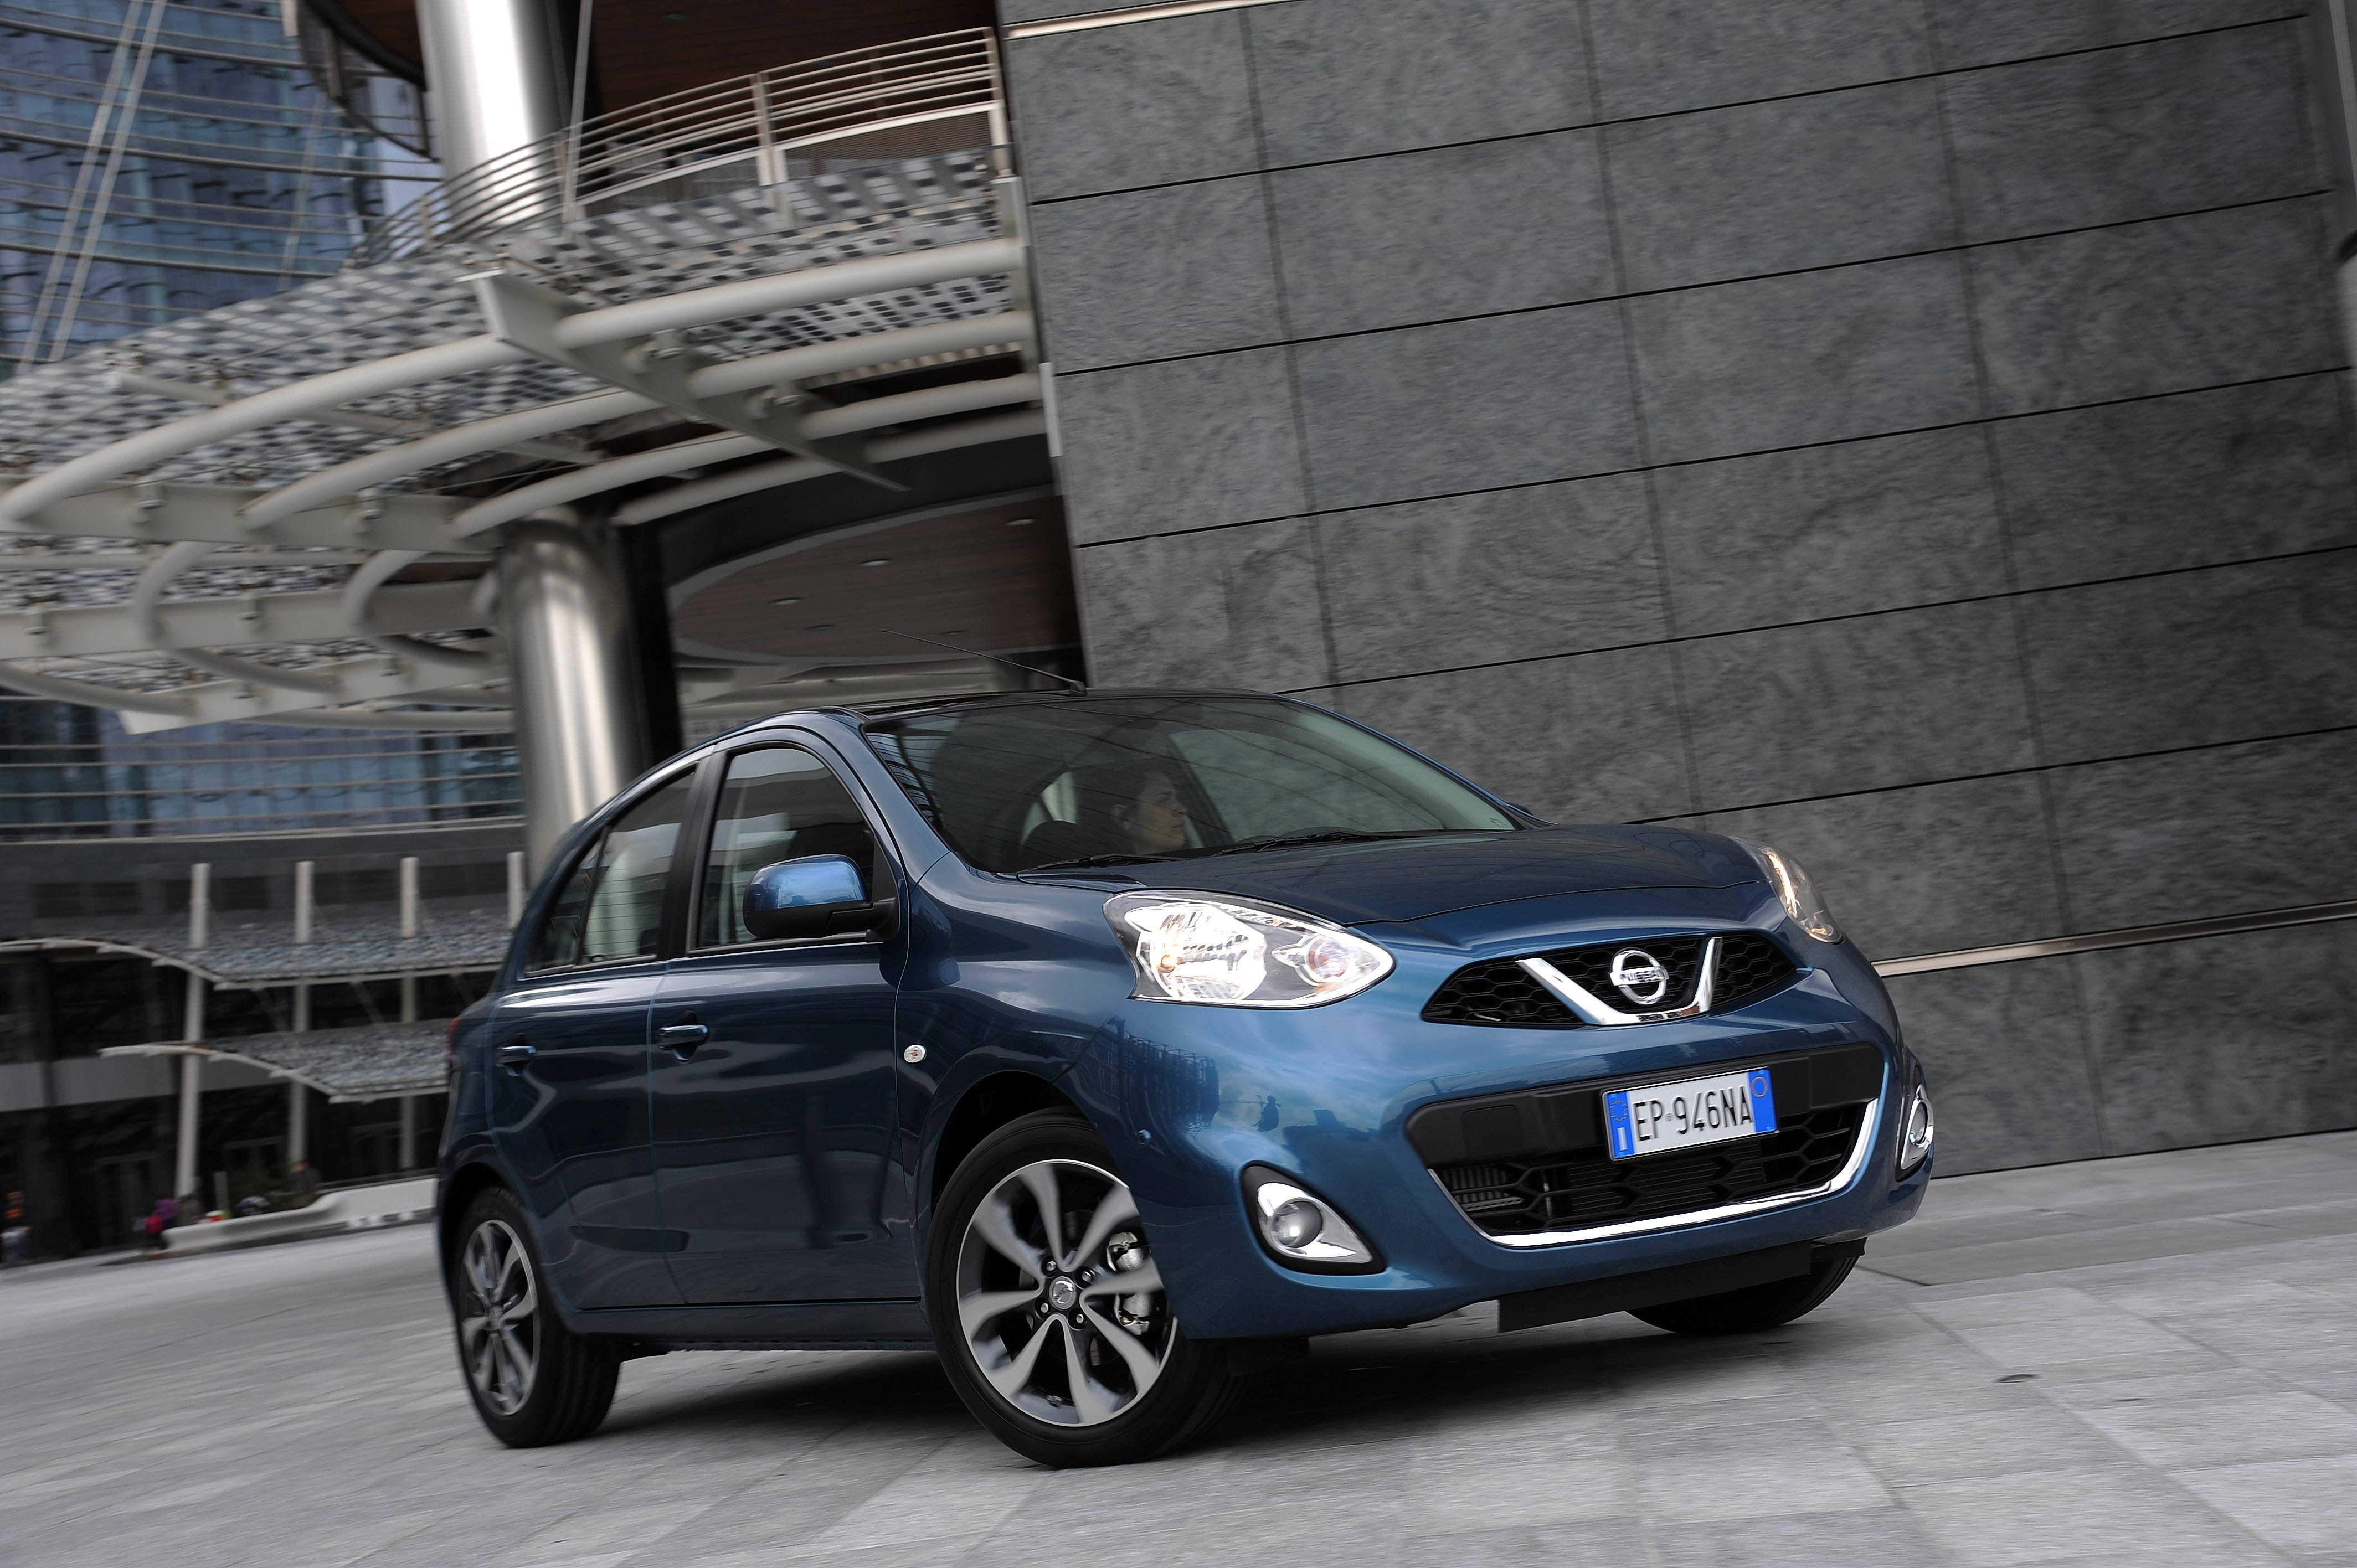 Neuer Nissan Micra | Billigstautos.com - Billige Autos - Infos & News